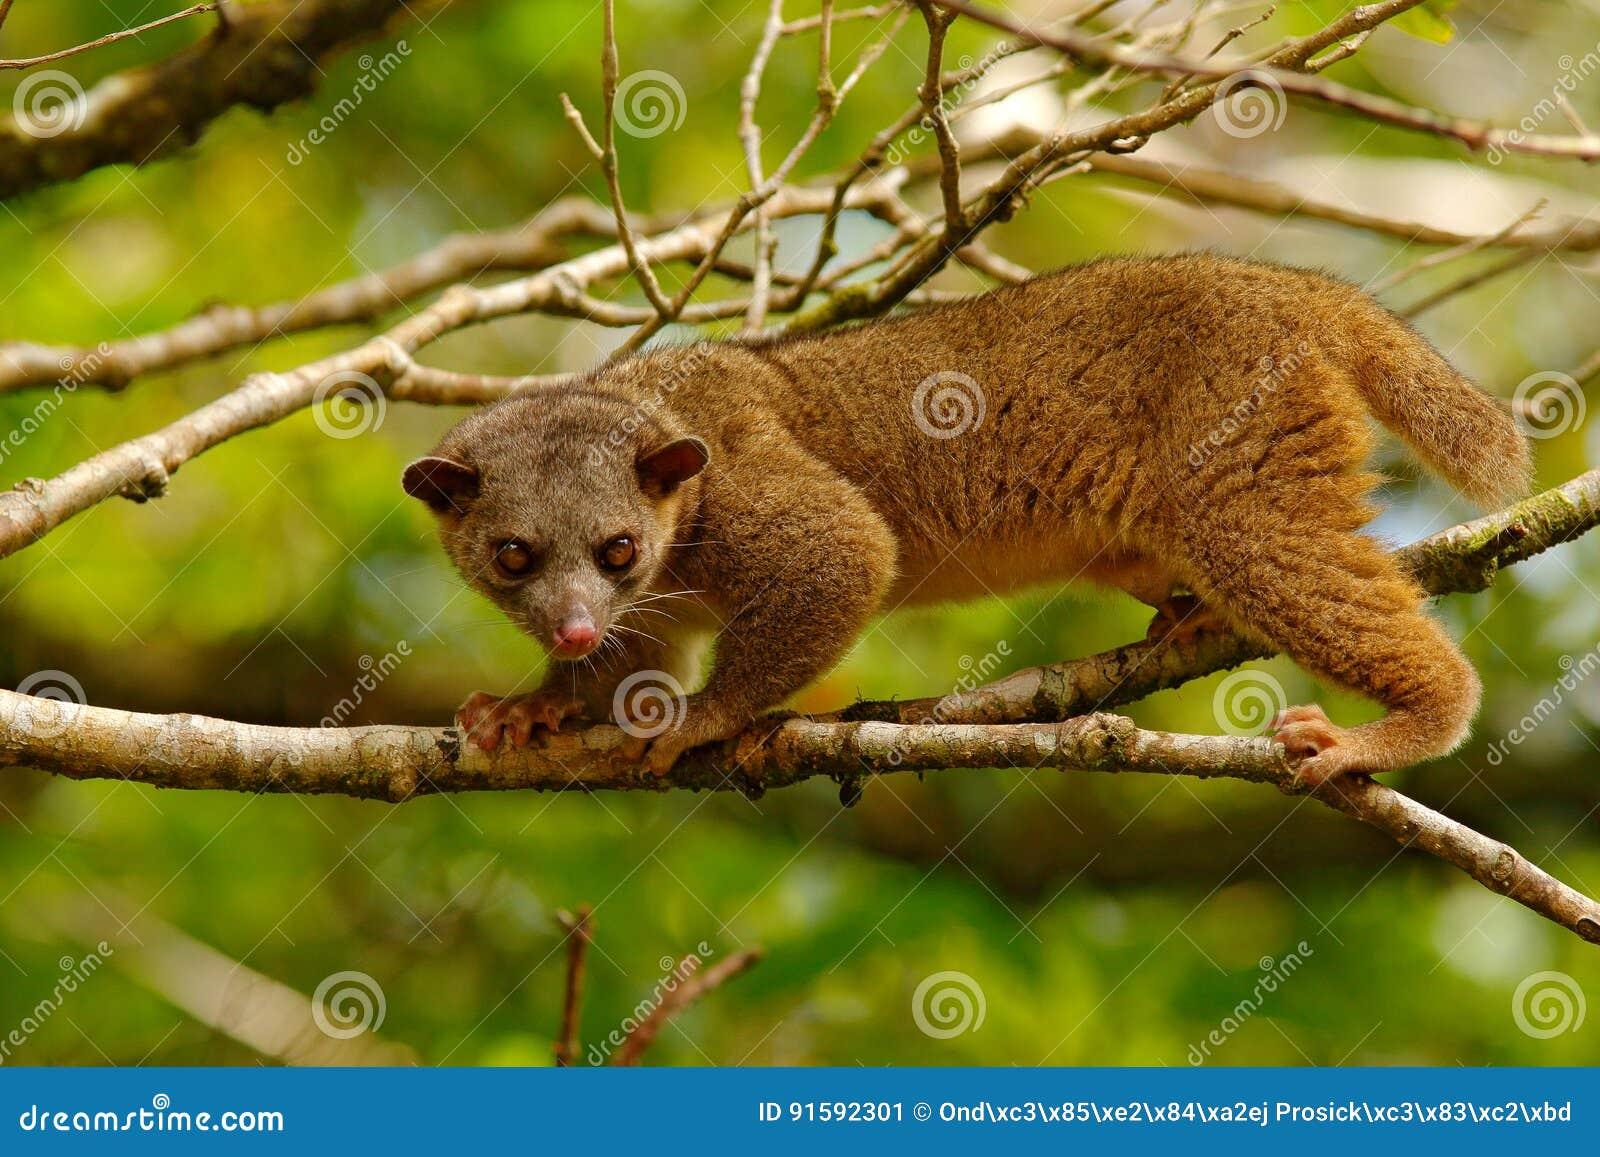 Kinkajou, Potos flavus, tropisch dier in de aard boshabitat Zoogdier in Costa Rica Het wildscène van aard Wilde Kinkajo